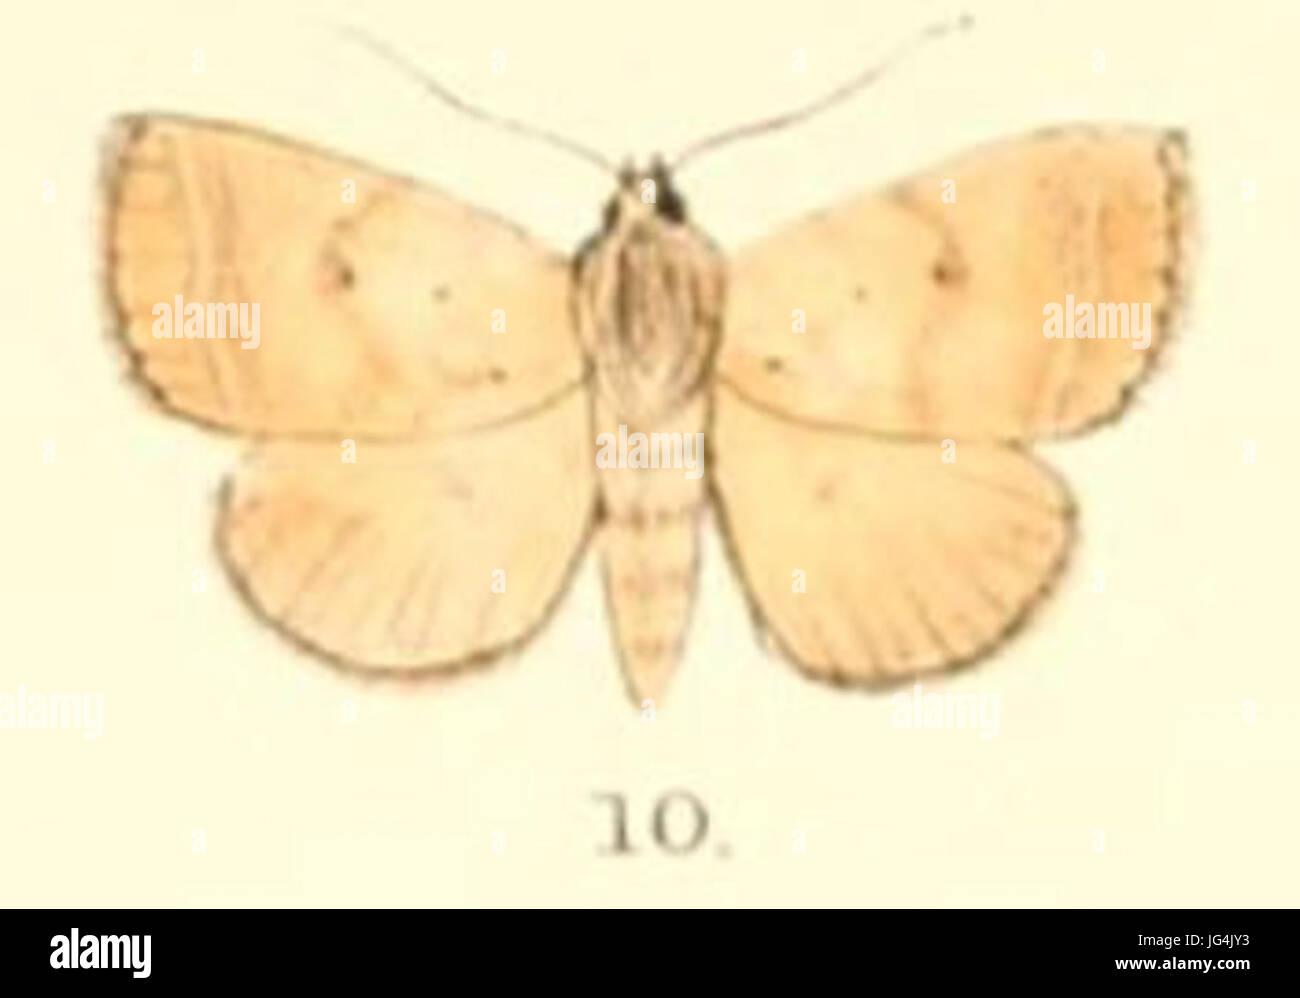 Pl.5-10-Plecoptera uniformis 28Moore 188 9 28Poaphila29 - Stock Image